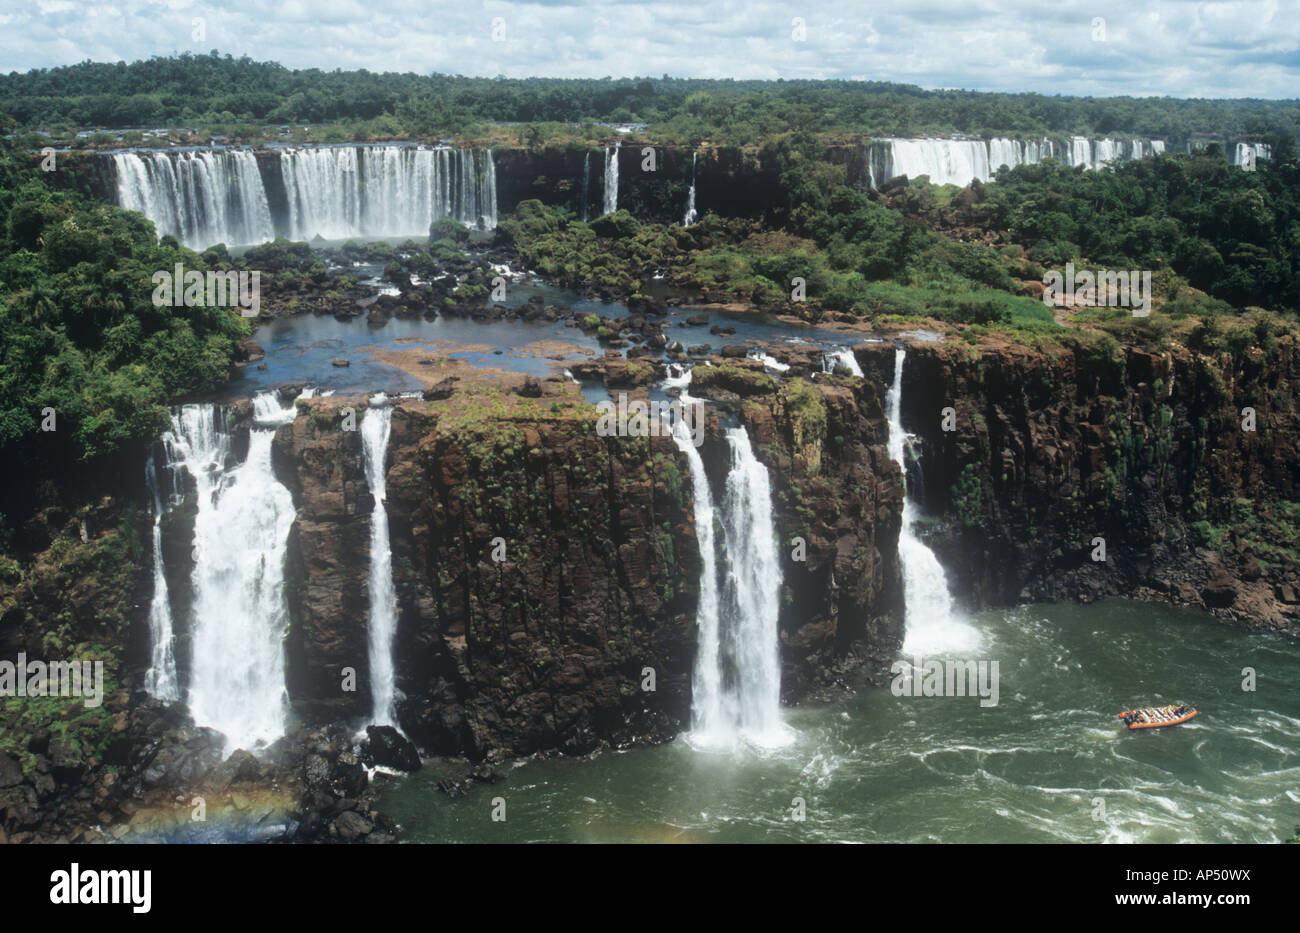 Iguacu falls from the Brazilian side. - Stock Image